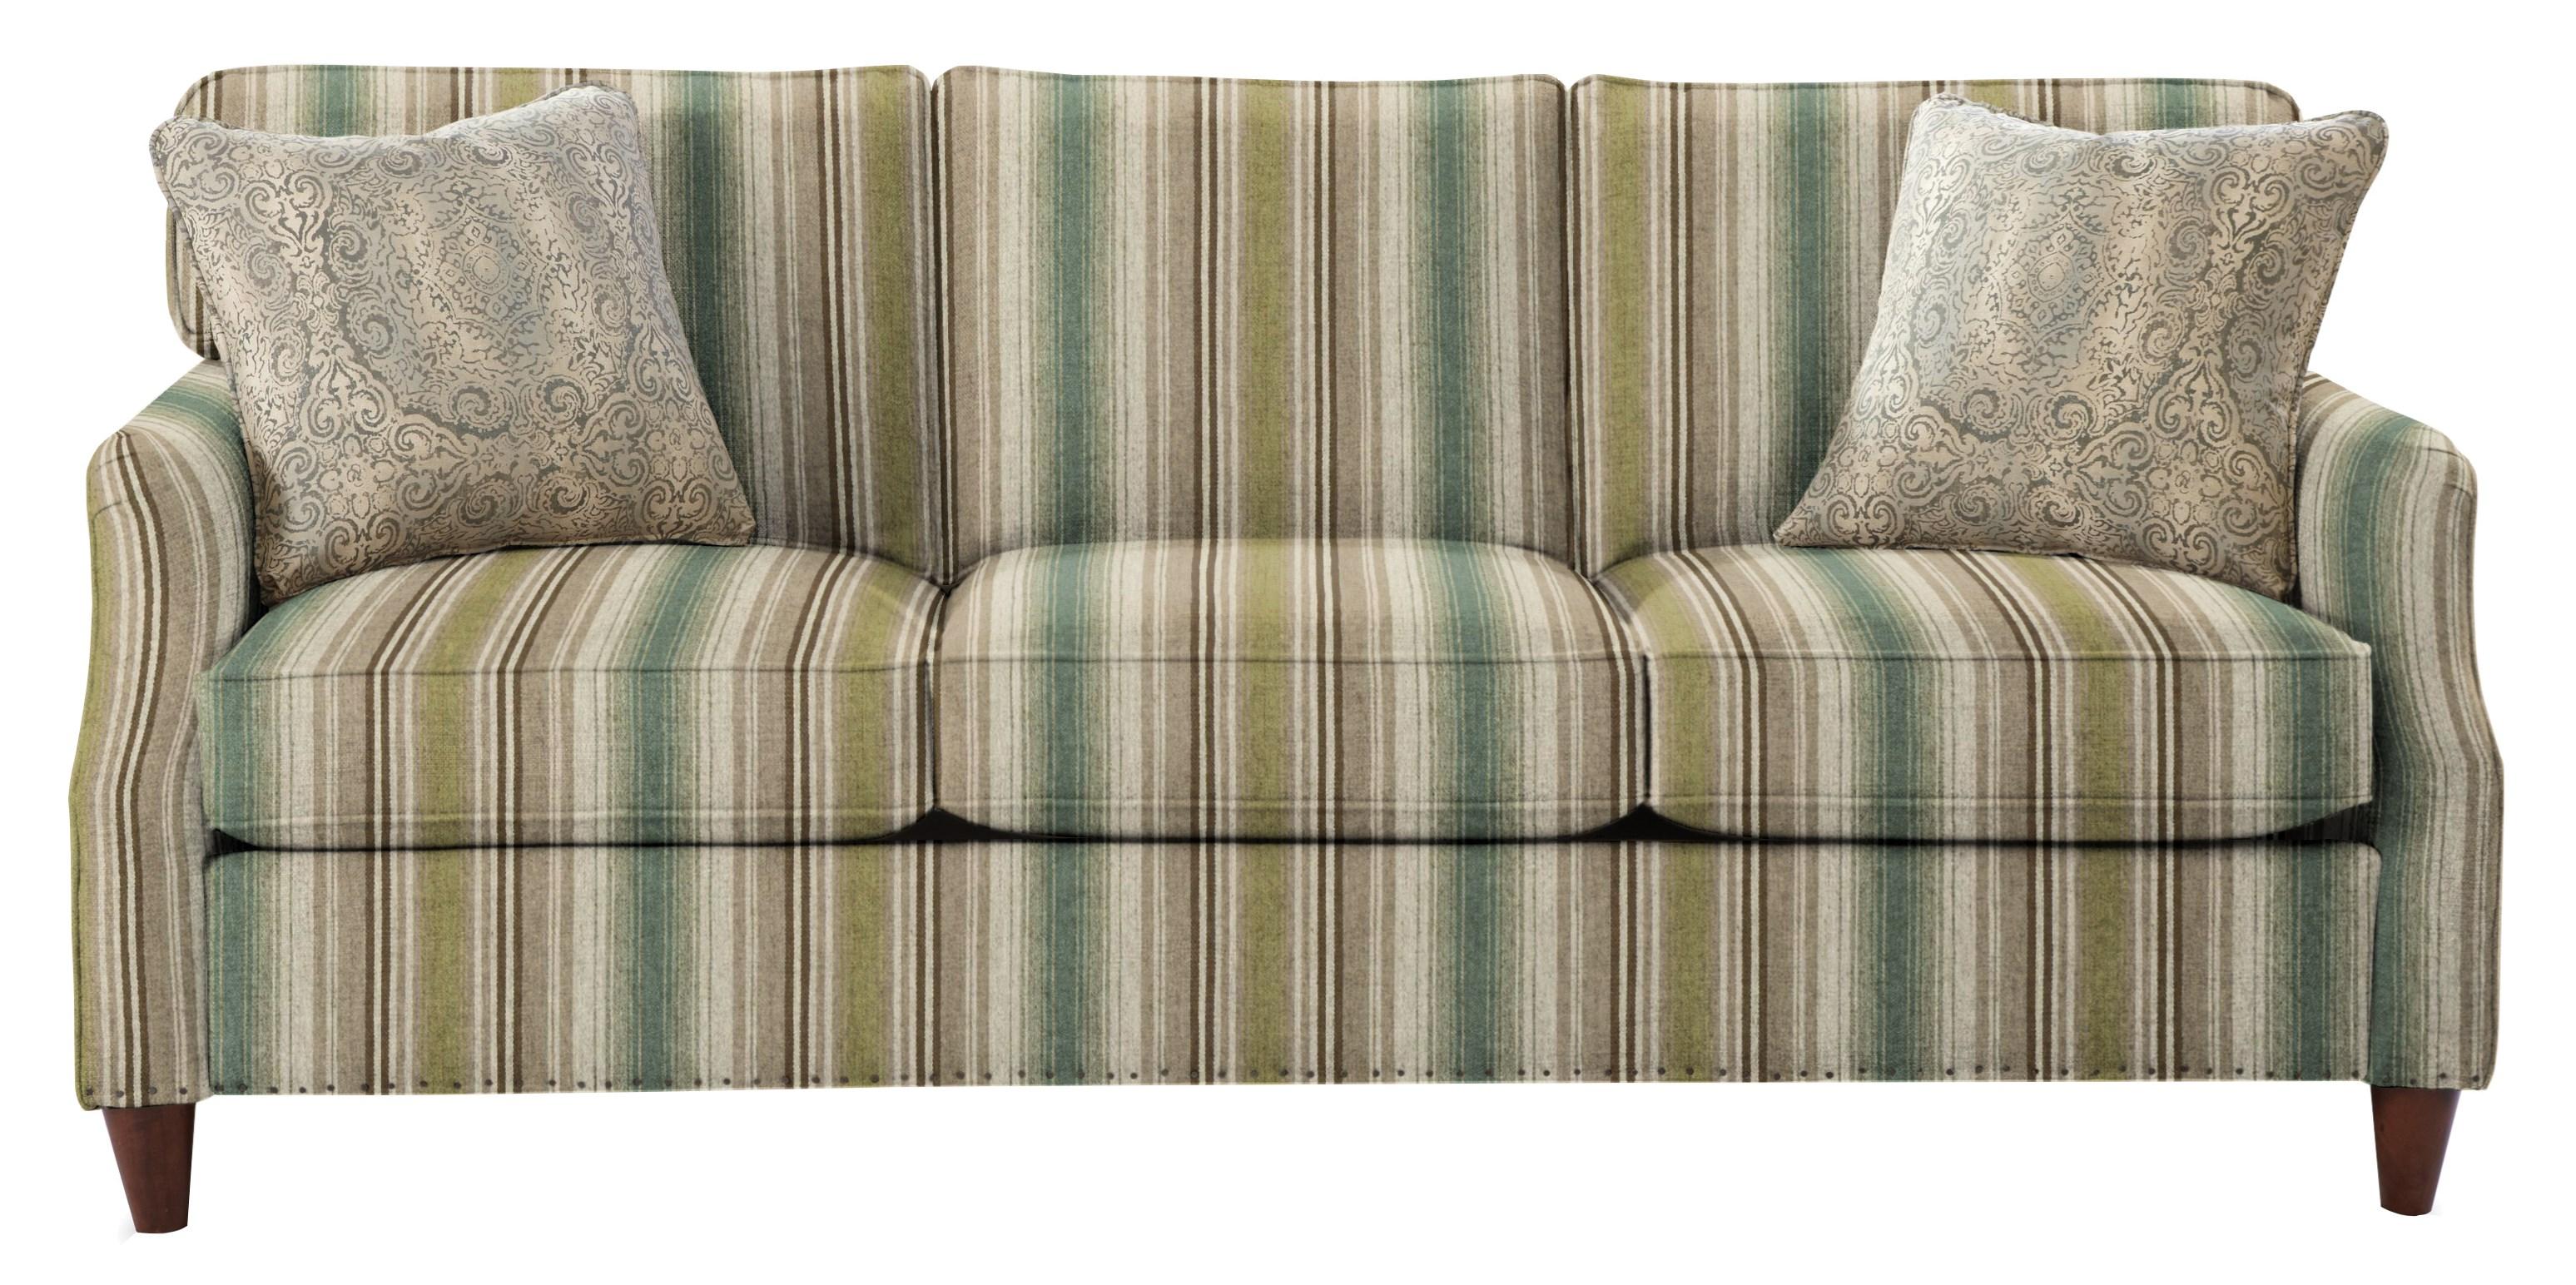 Craftmaster 7363 Sofa - Item Number: 736350-LISMORE-15